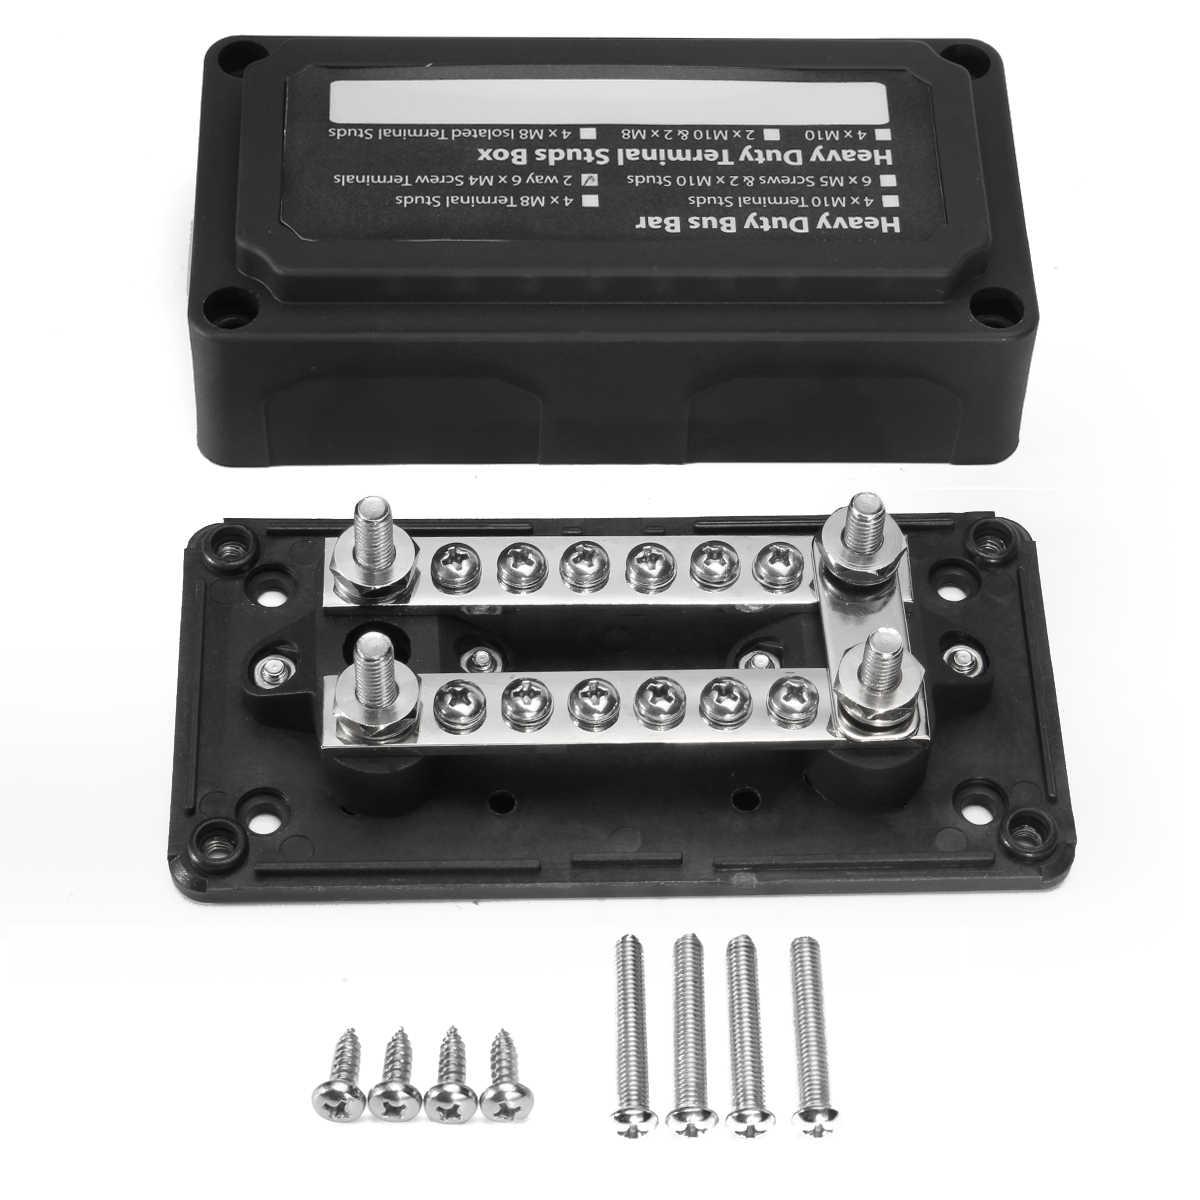 car blade fuse box block 48v heavy duty modular design dual bus bars with connecting [ 1200 x 1200 Pixel ]